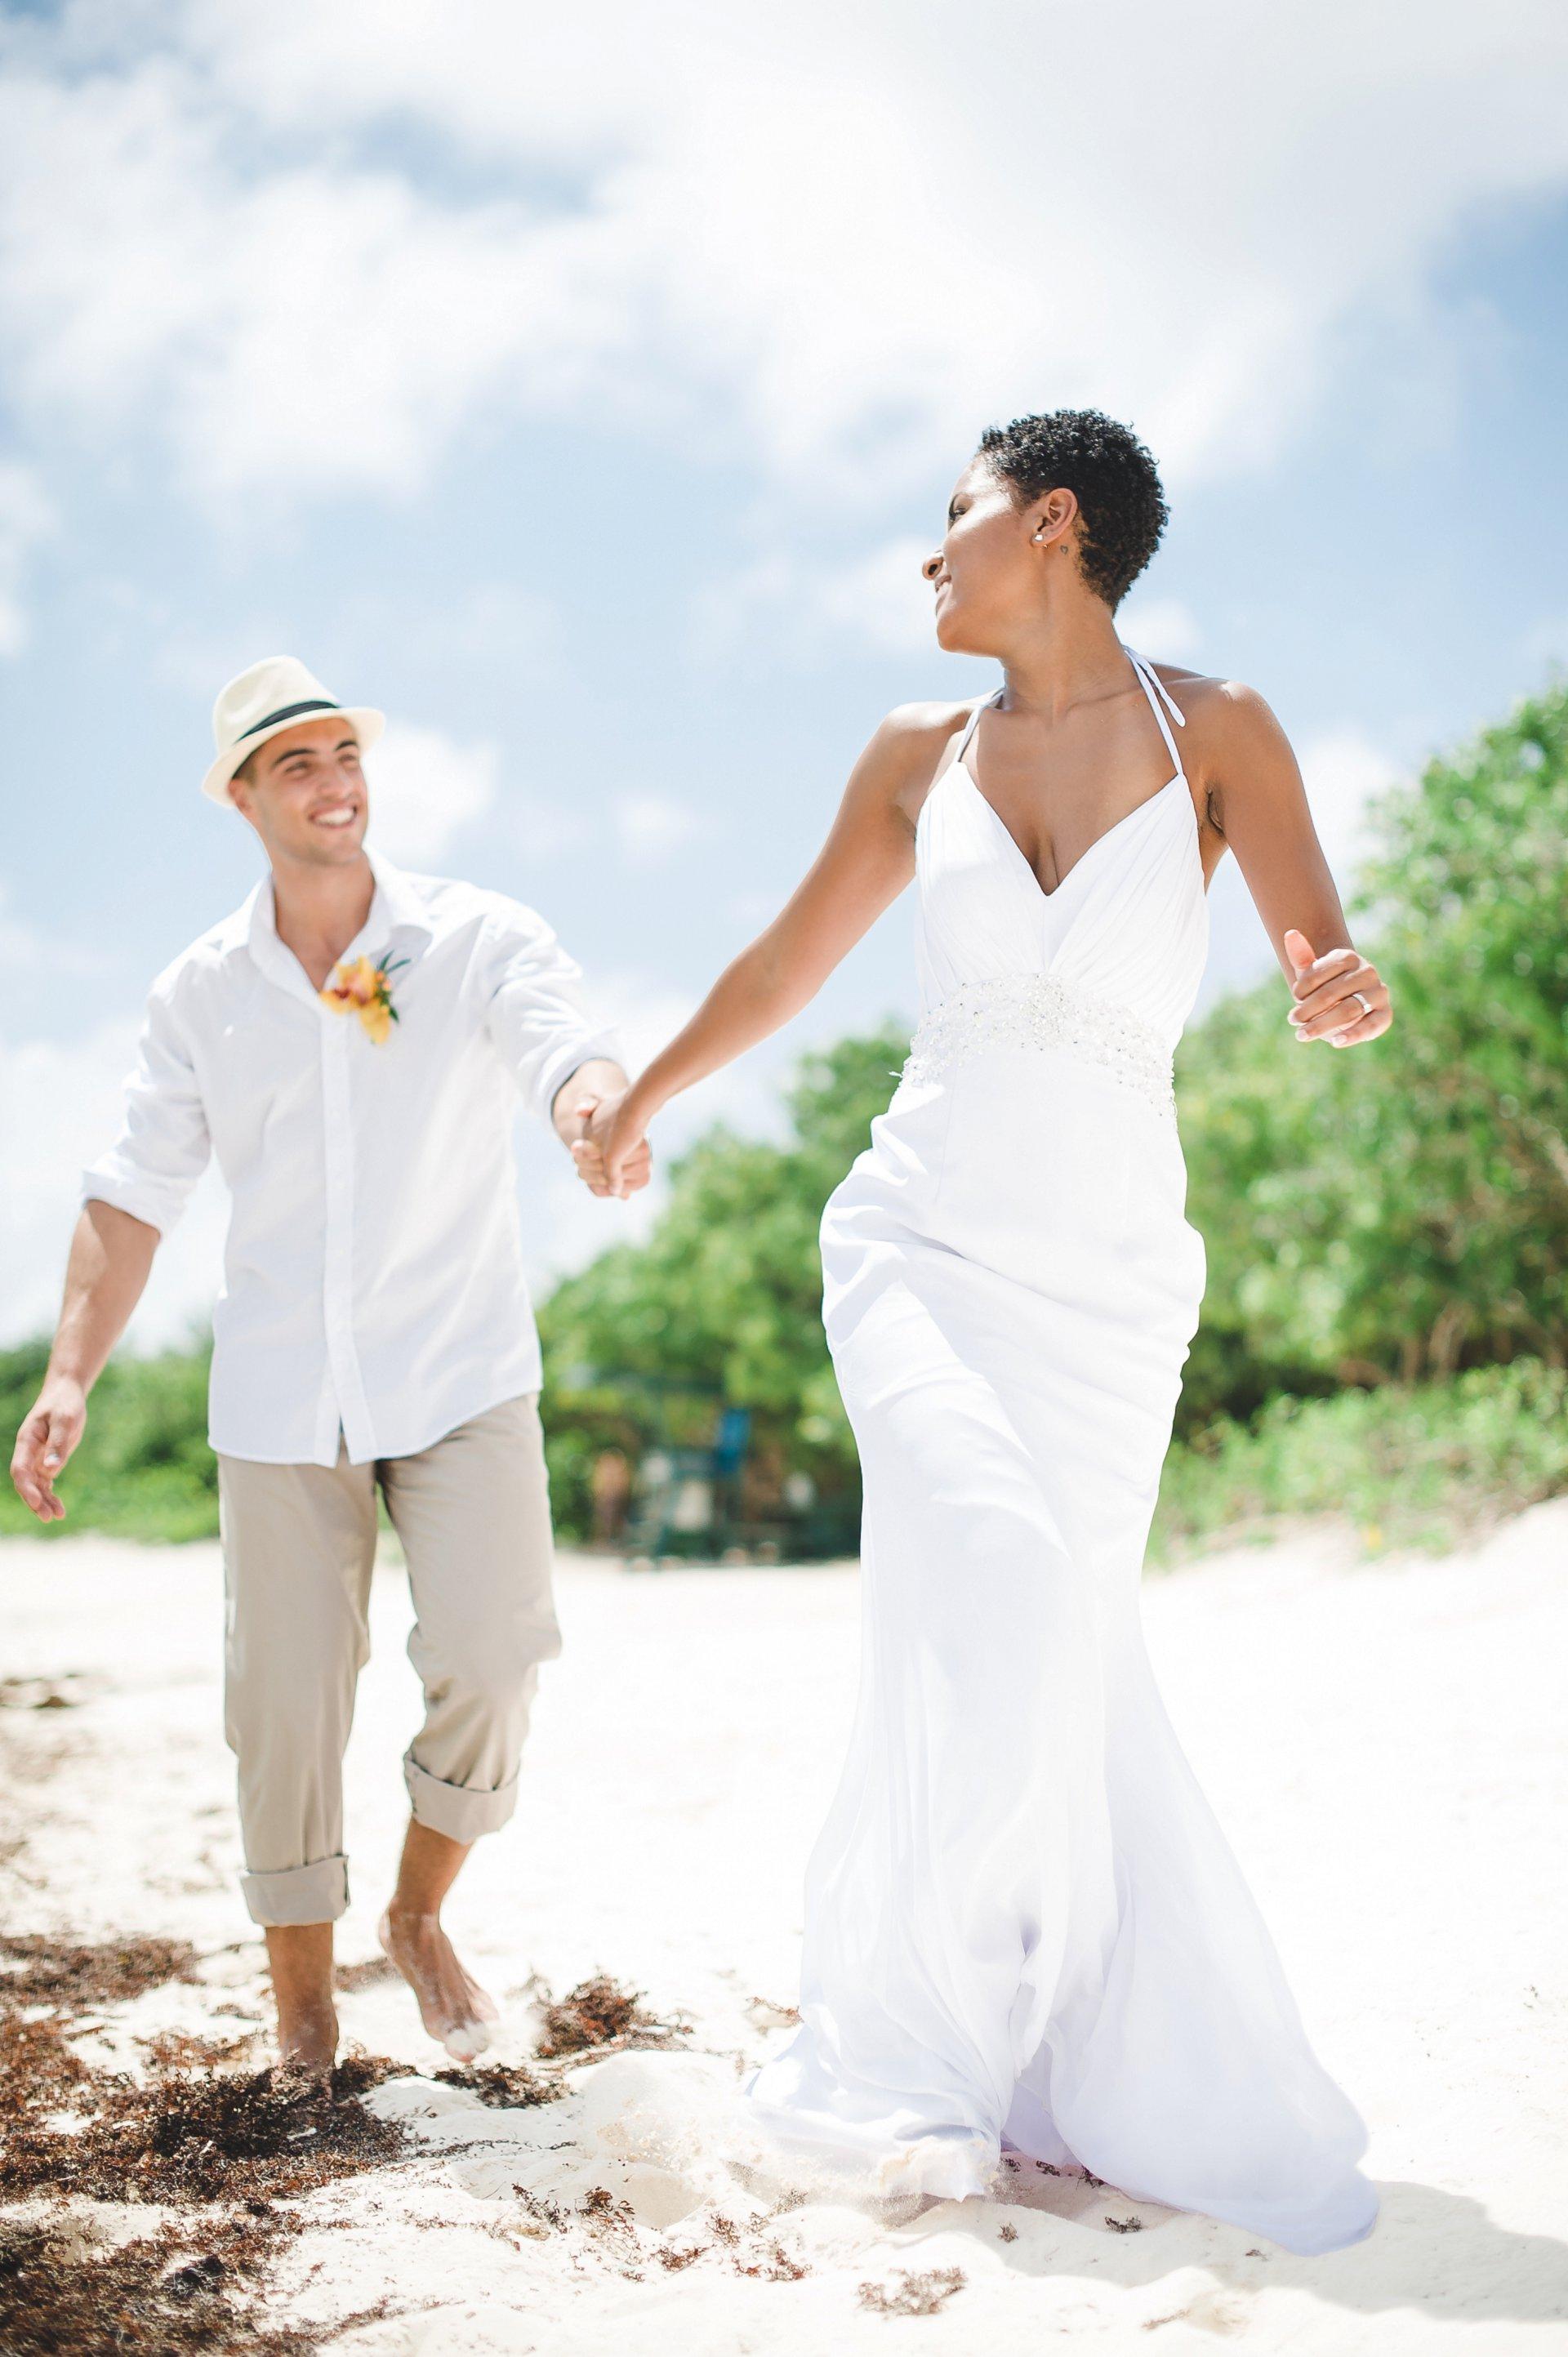 Elopement wedding couple runs down the beach at Lindquist Beach, St. Thomas